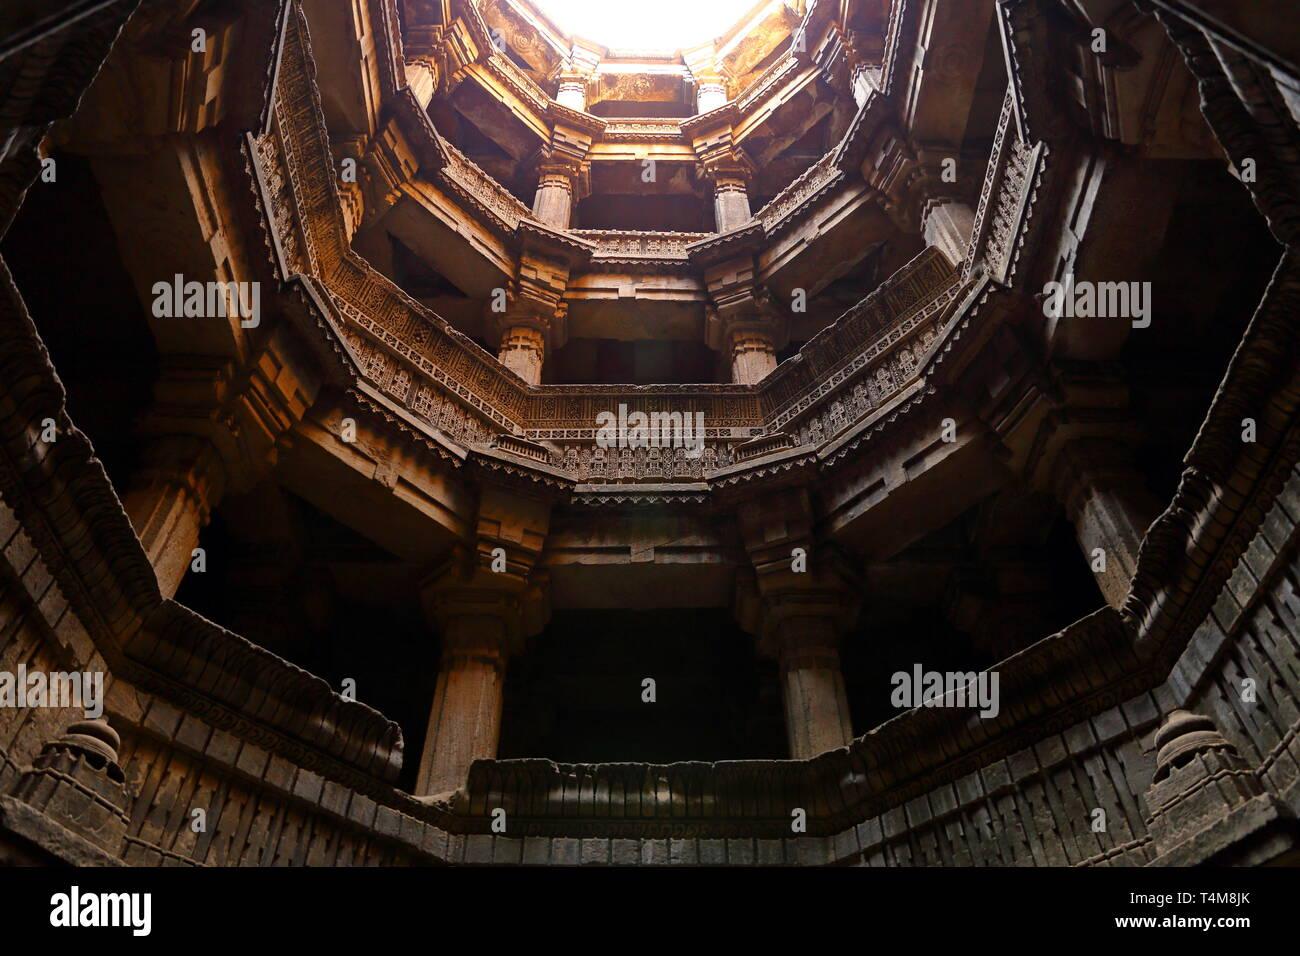 Dada Harir Vav stepwell is a Hindu water building in Asarwa Ahmedabad in the Indian state of Gujarat. - Stock Image